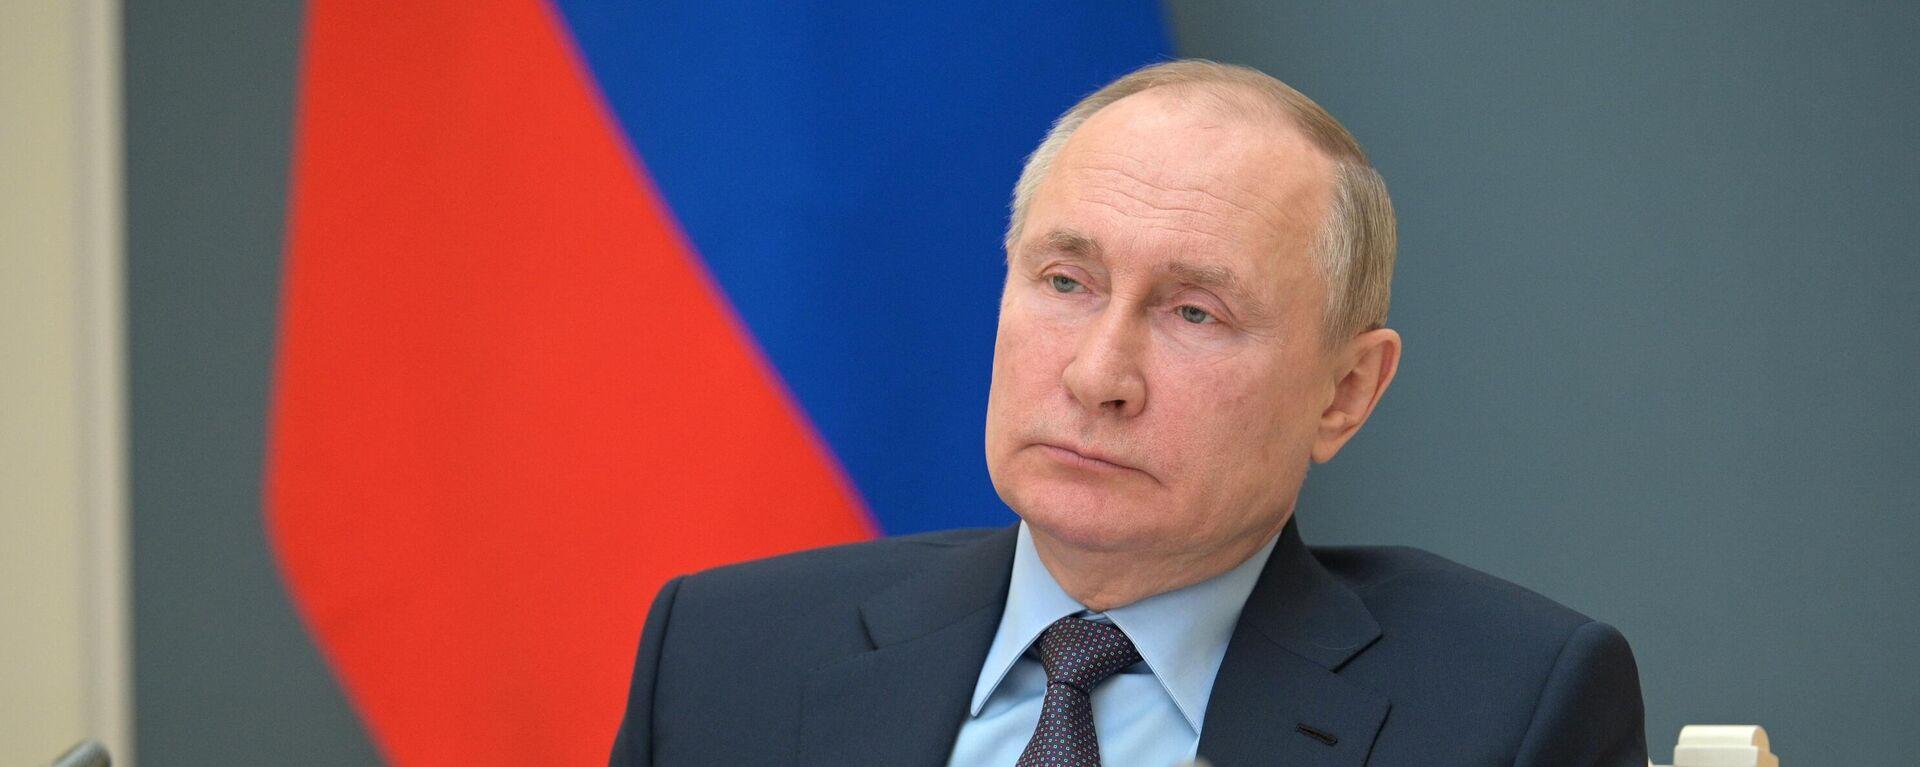 Vladímir Putin, el presidente ruso - Sputnik Mundo, 1920, 11.06.2021